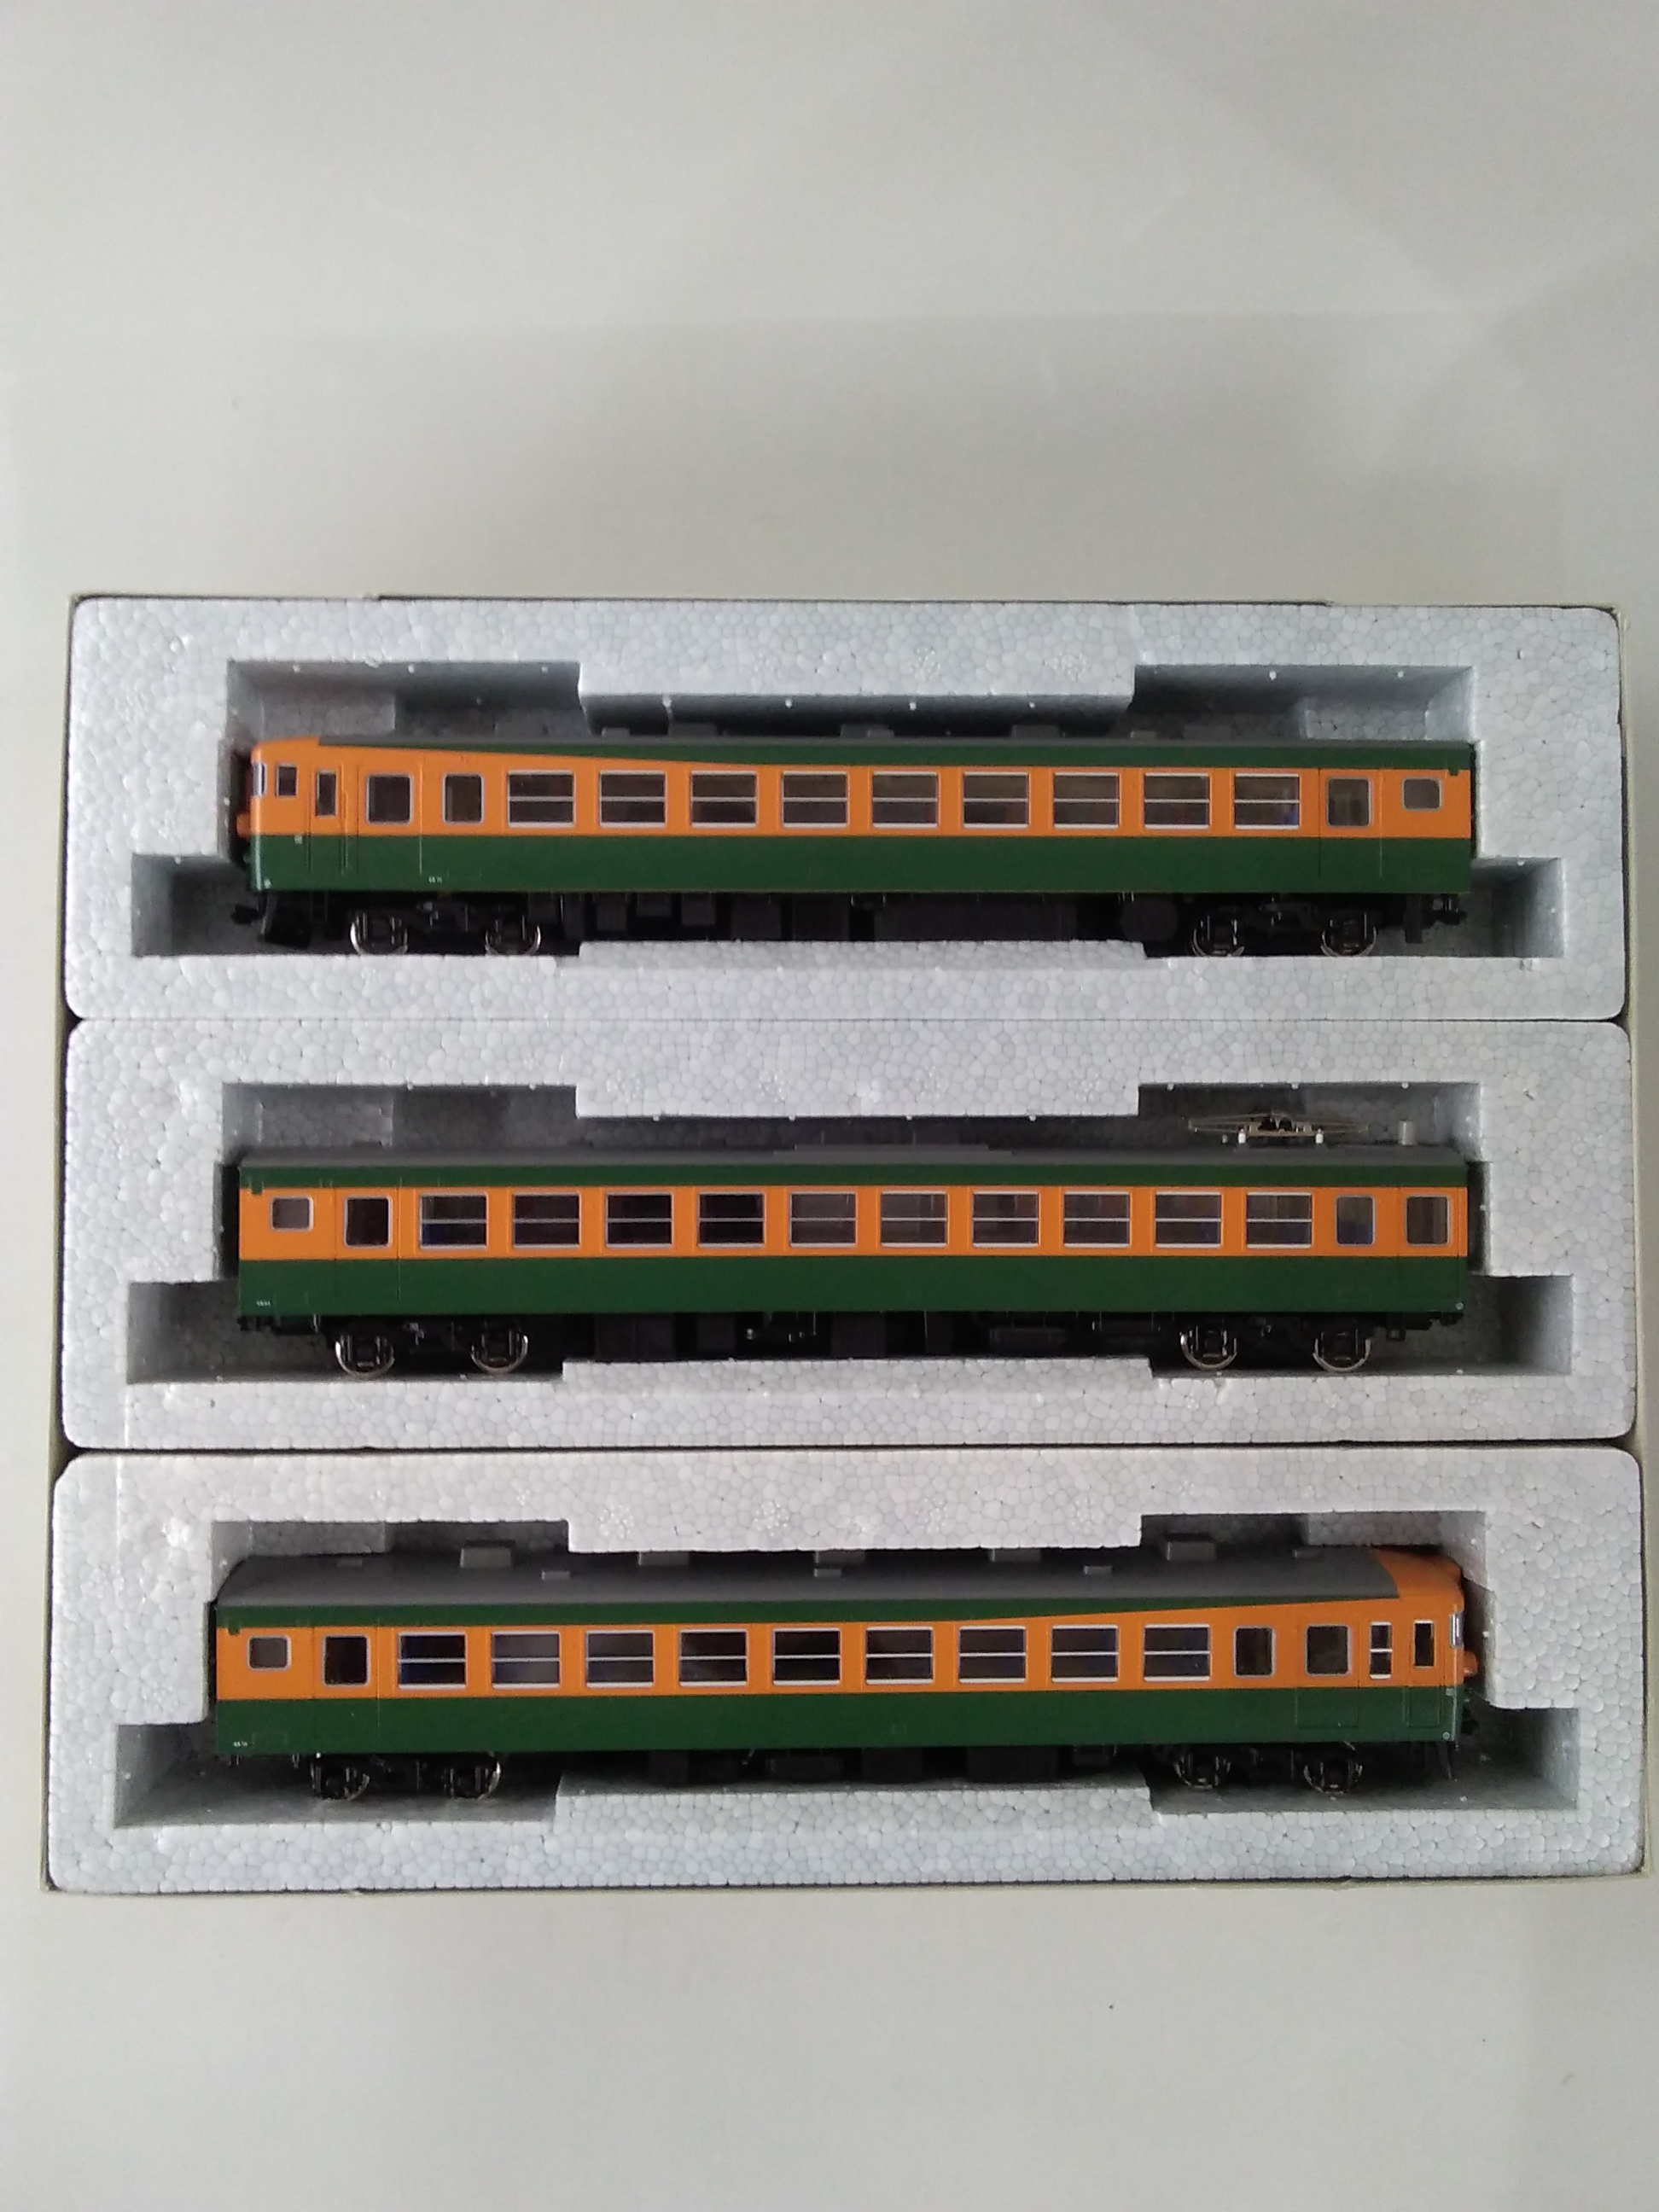 HOゲージ 3-506 165系 急行形電車 増結 3両セッ|KATO